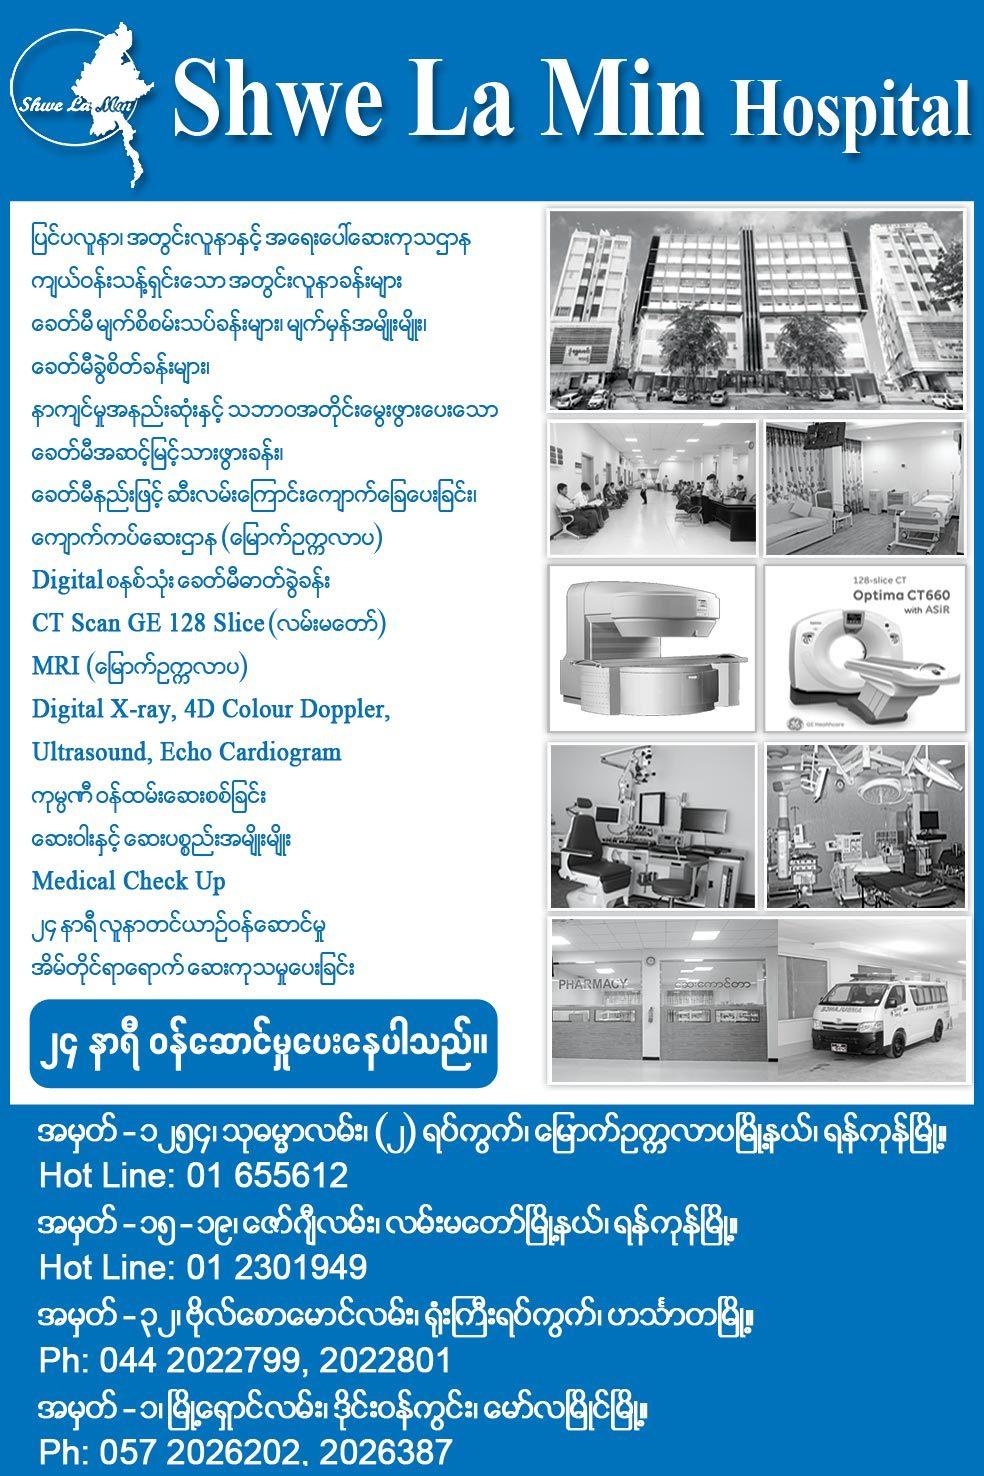 Shwe-La-Min_Hospitals-(Private)_(B)_1615.jpg